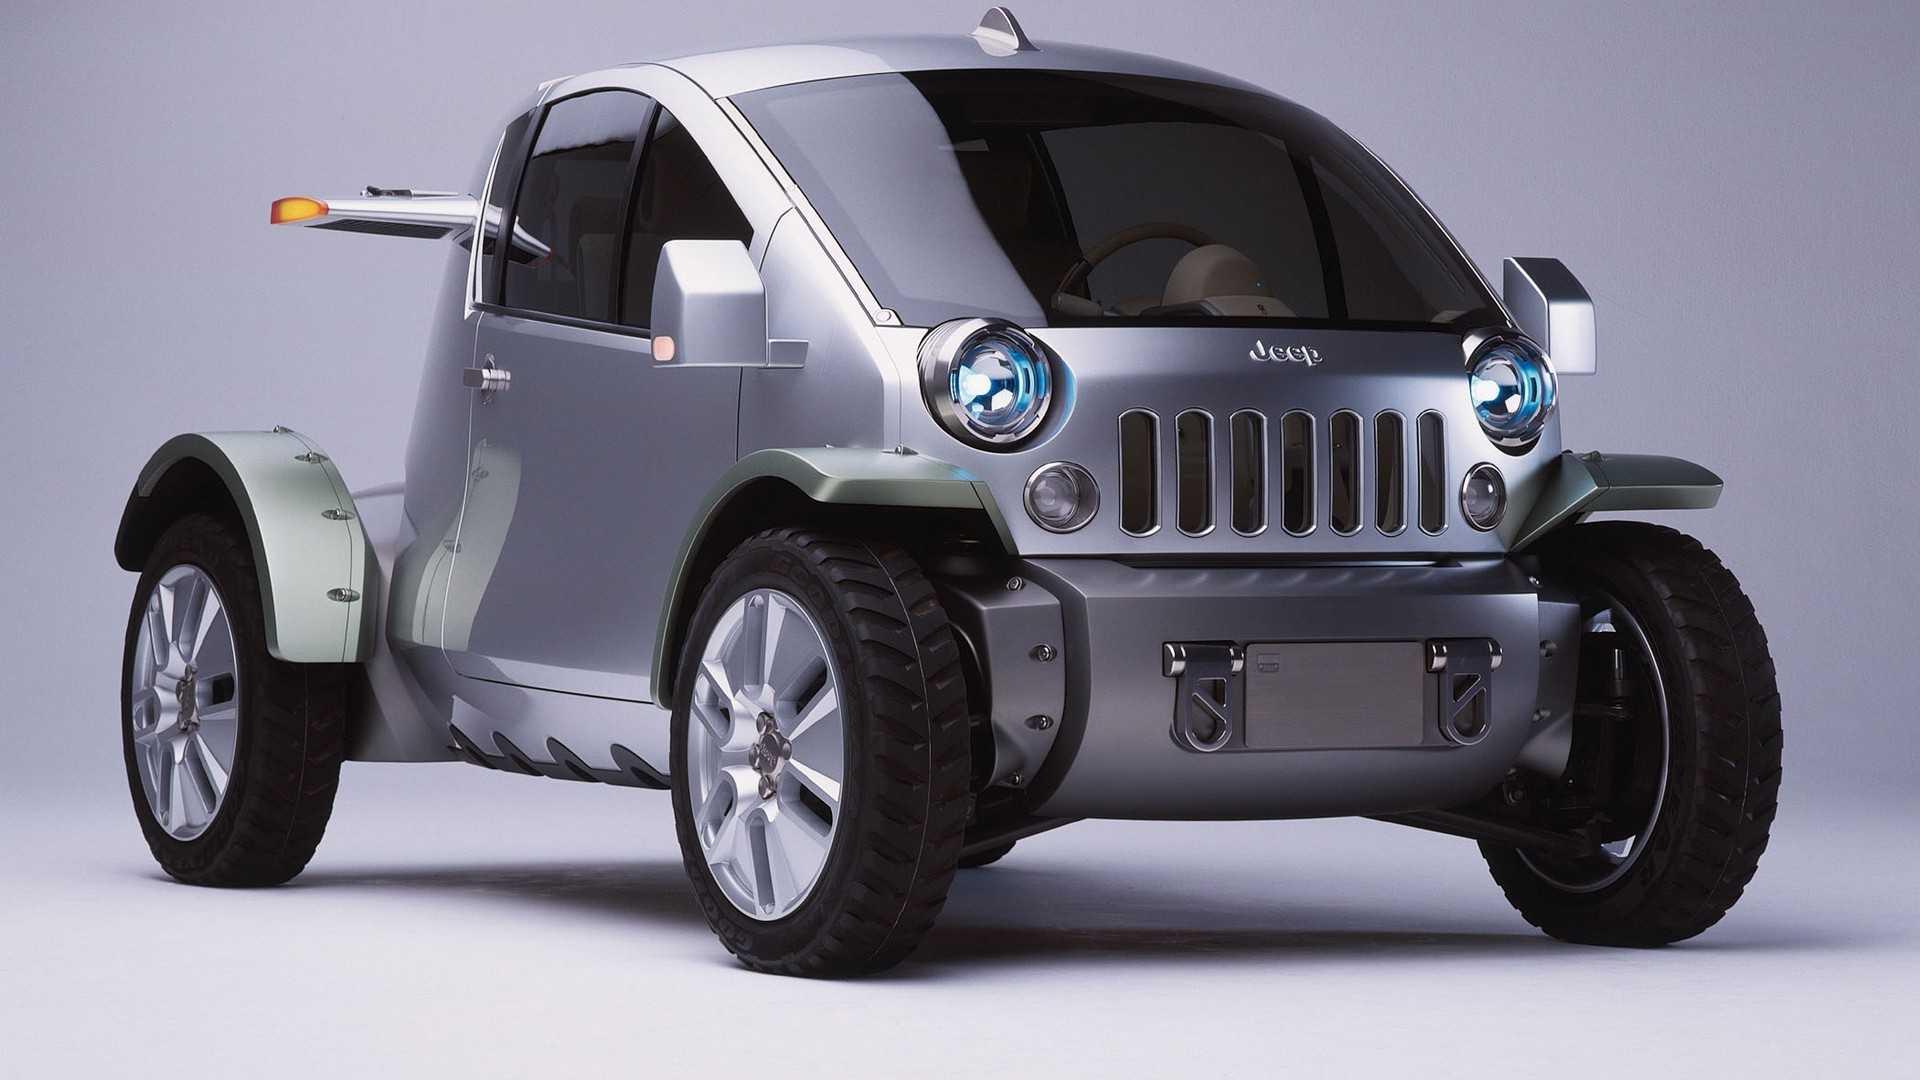 Jeep Treo concept 2003 (9)